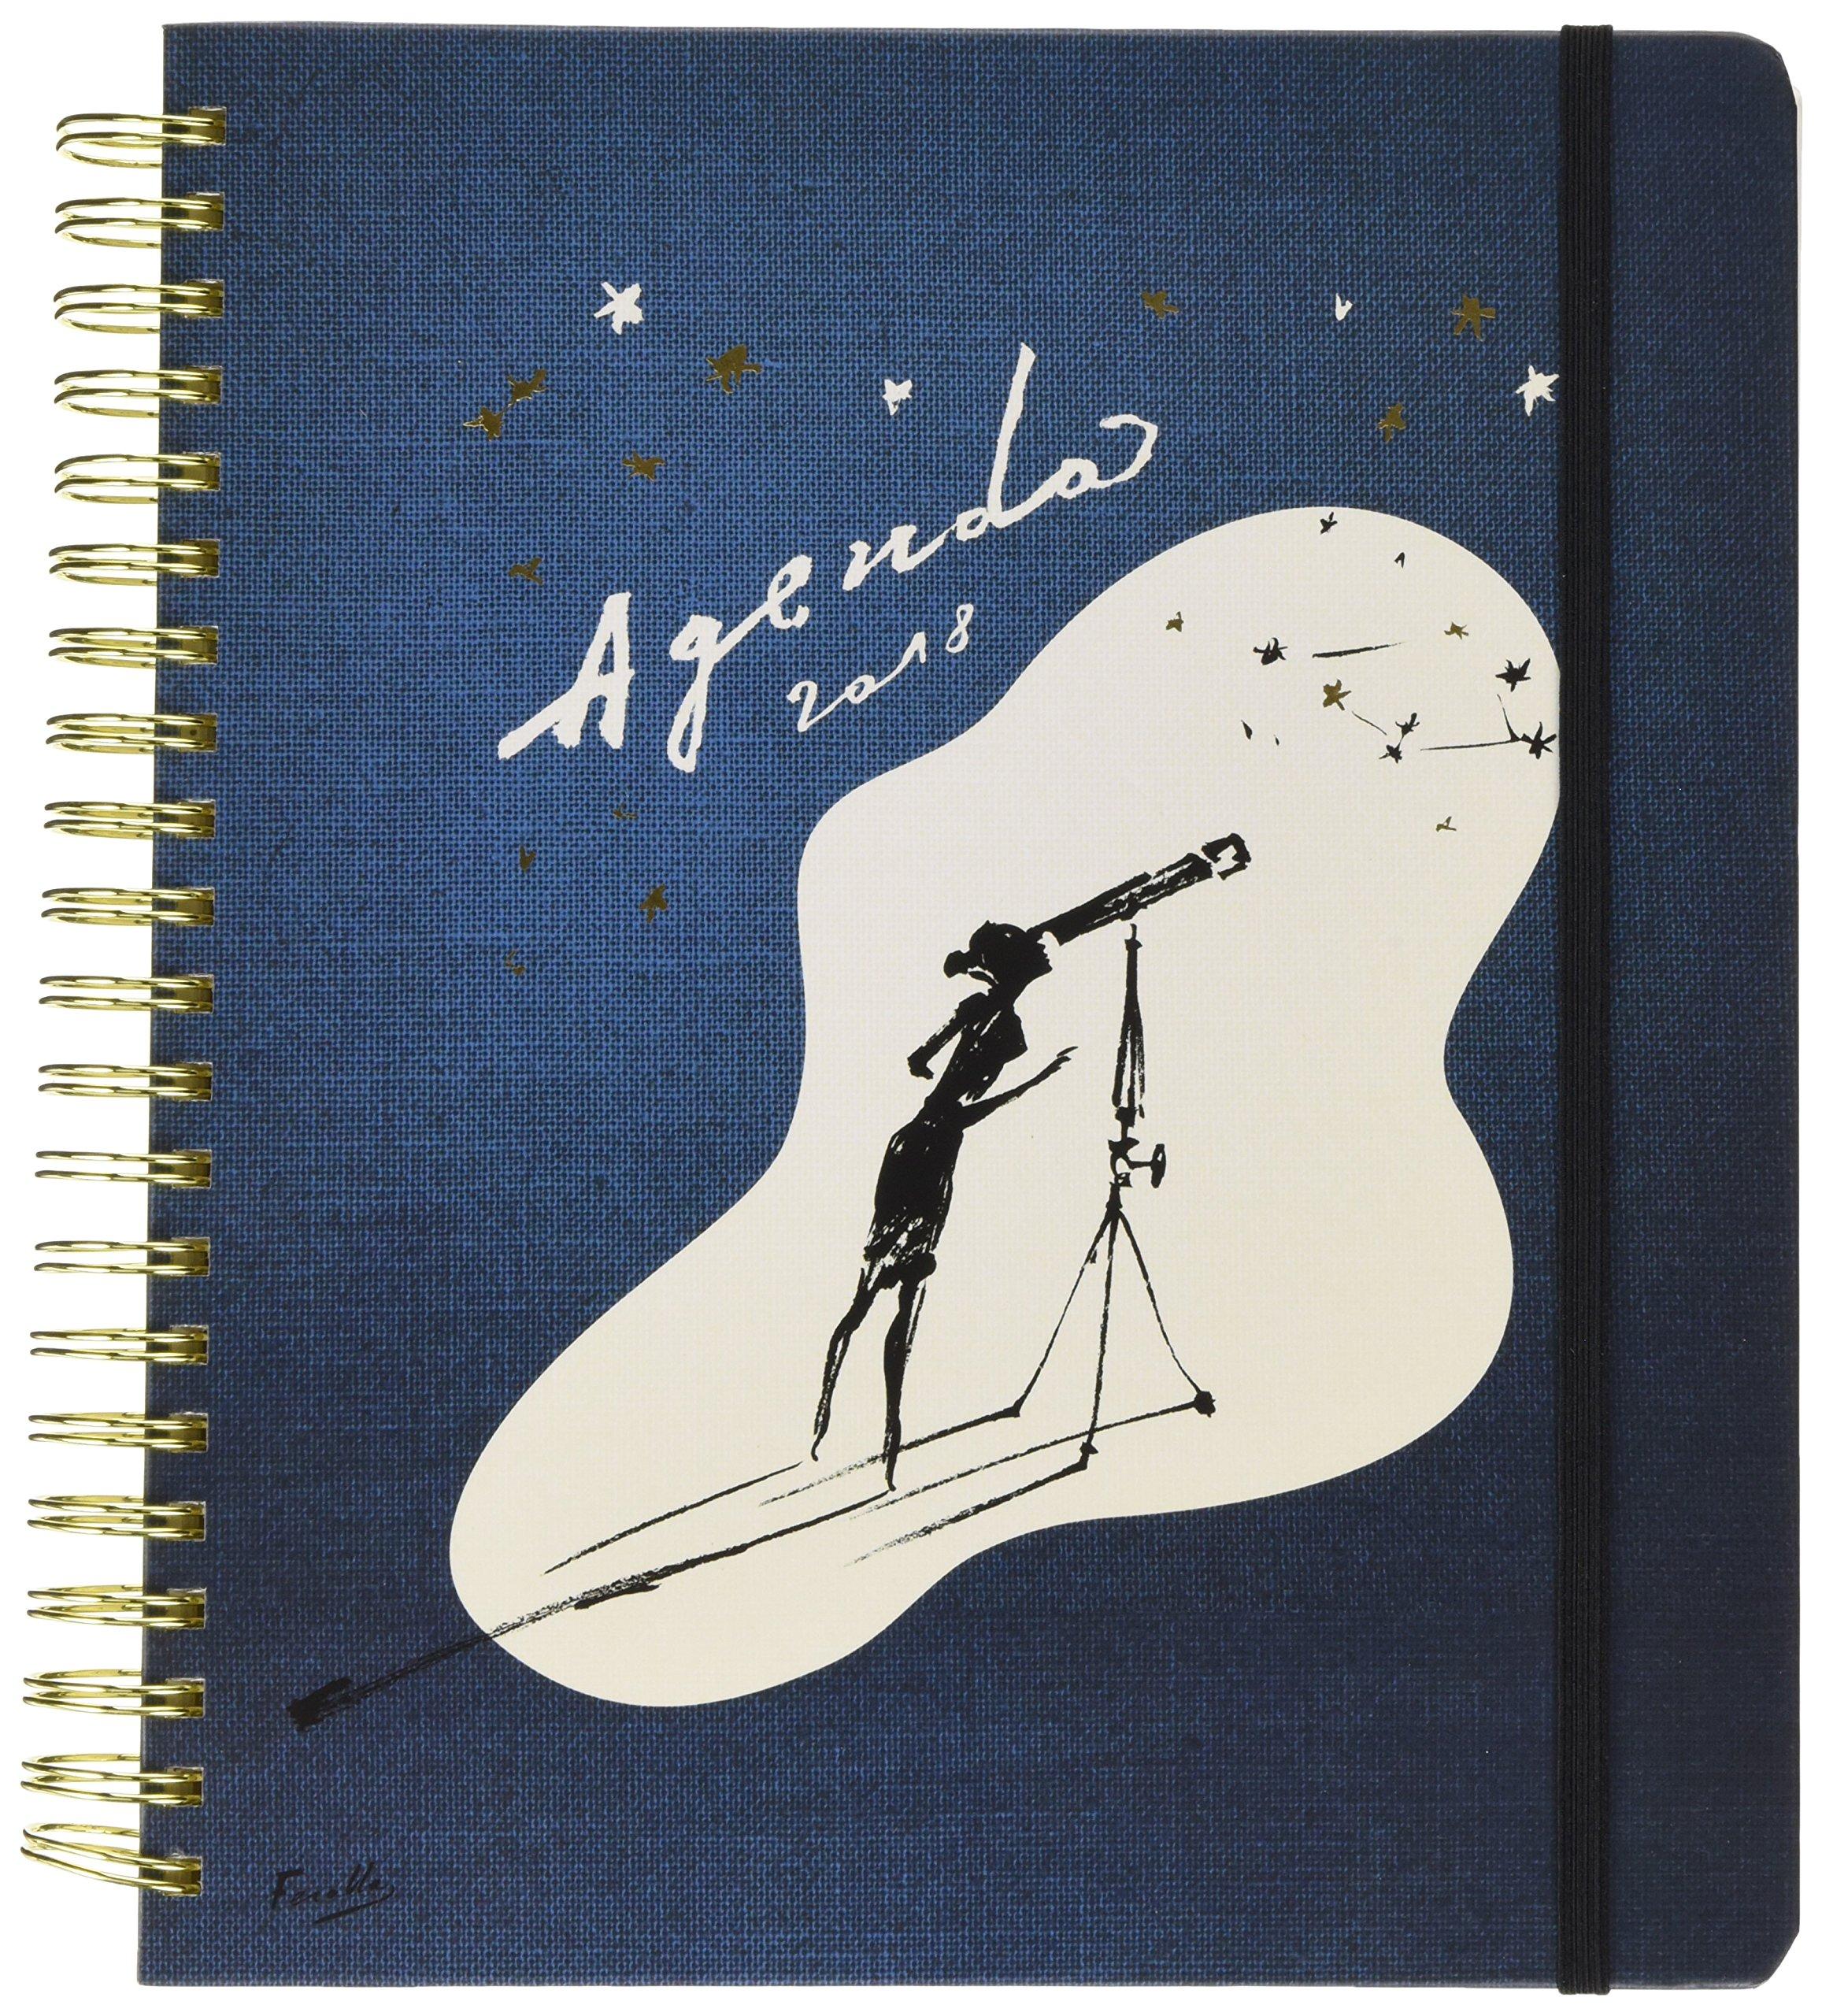 Kate Spade 2017-18 17 Month Academic Calender, Zodiac, 11'' x 10'' (173250) by Kate Spade New York